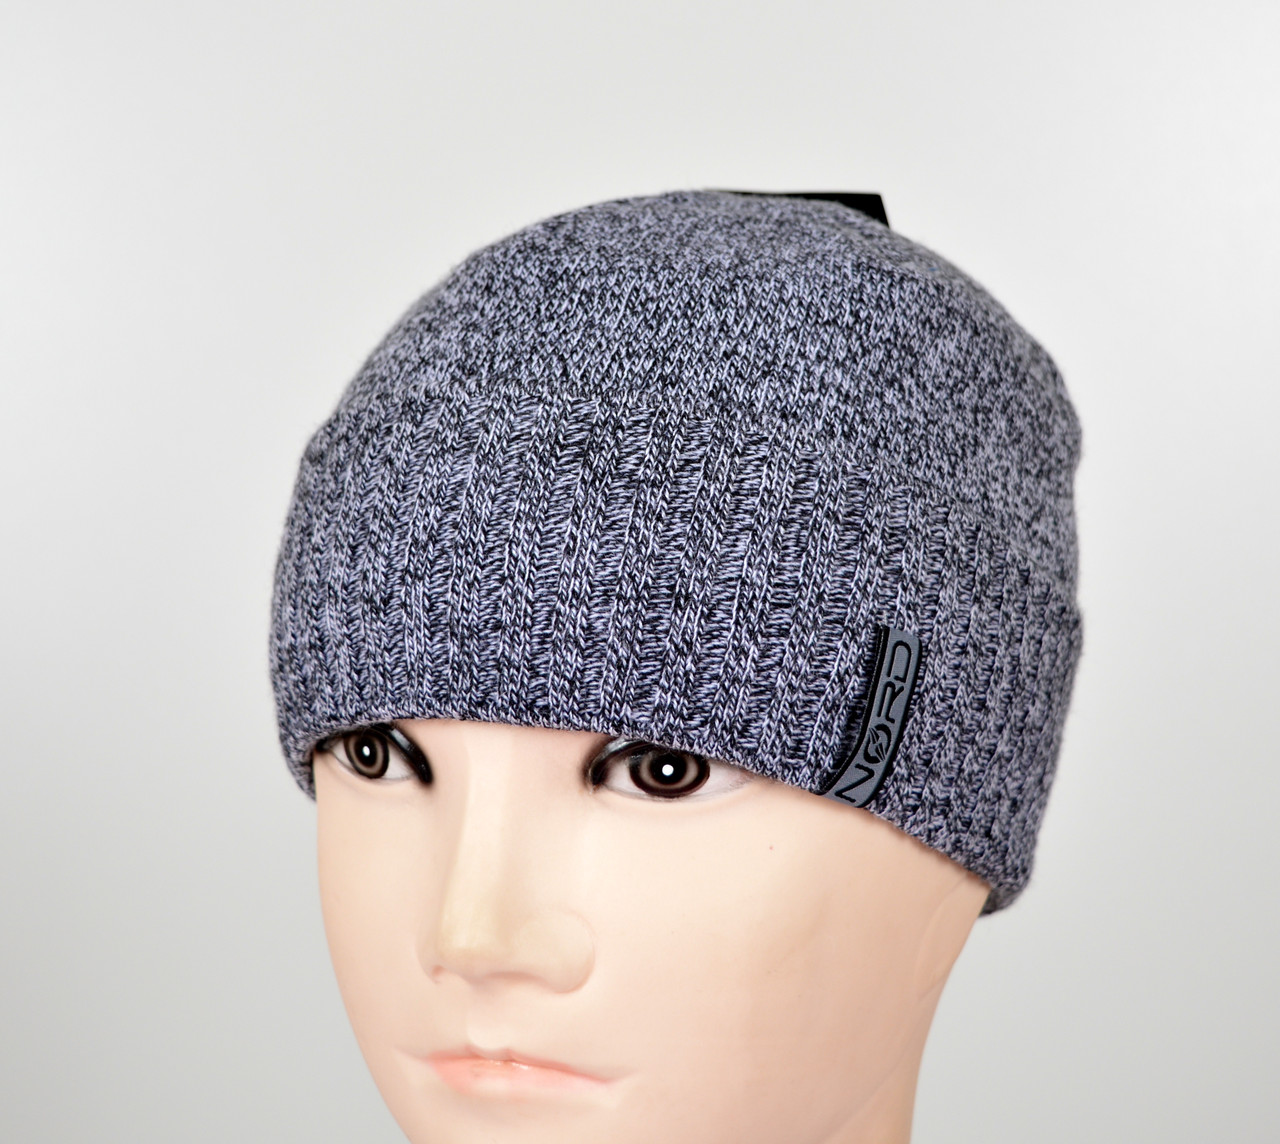 Мужская шапка Nord S-1803 березка